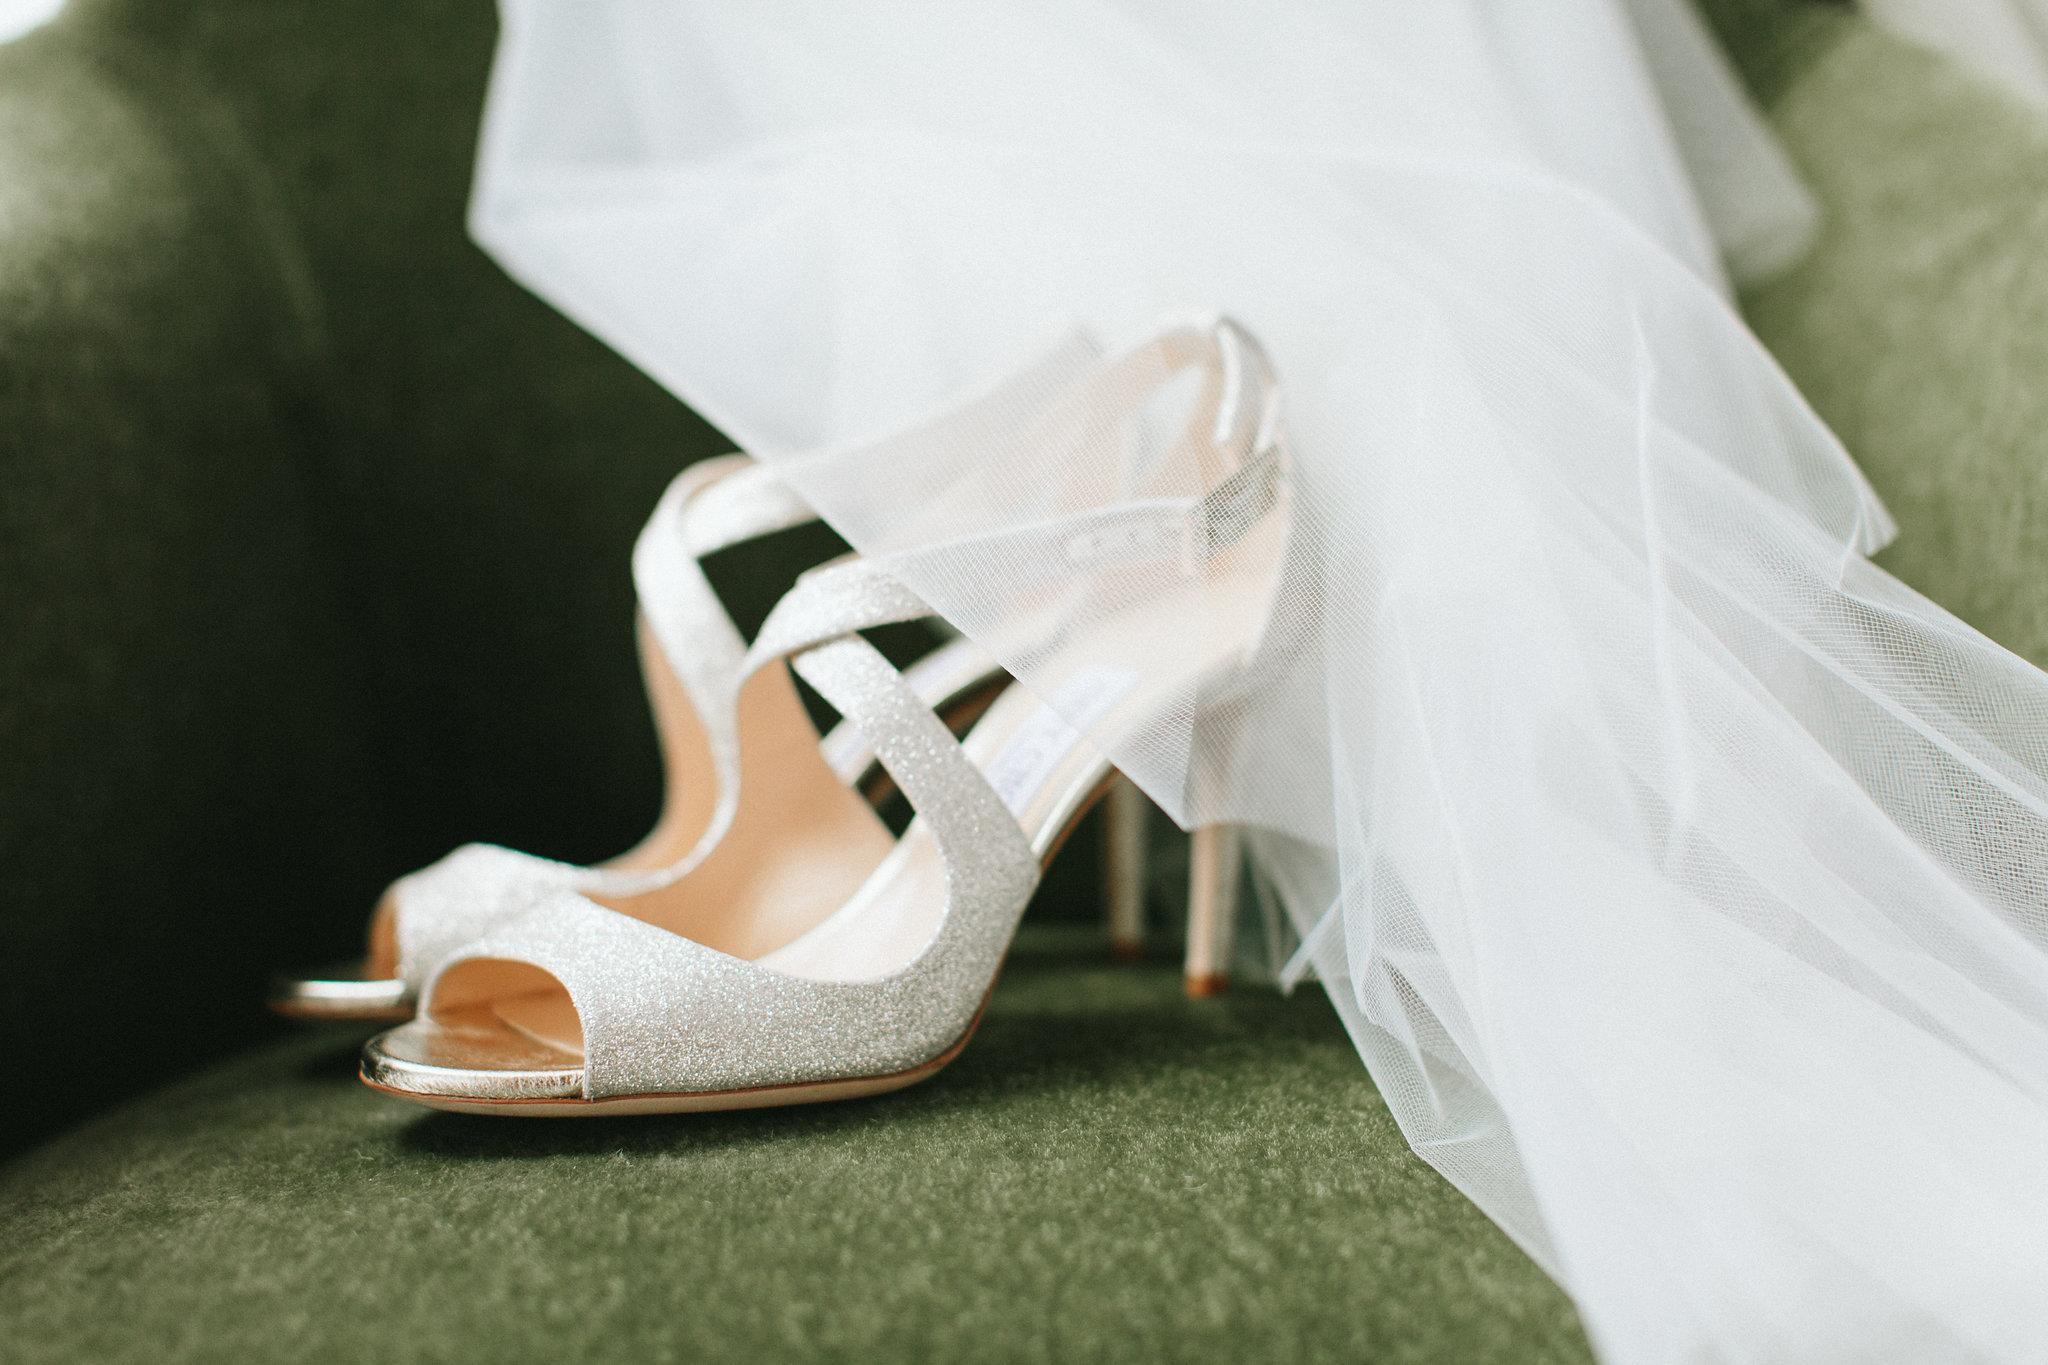 bowery-hotel-wedding-jove-meyer-events-07.jpg